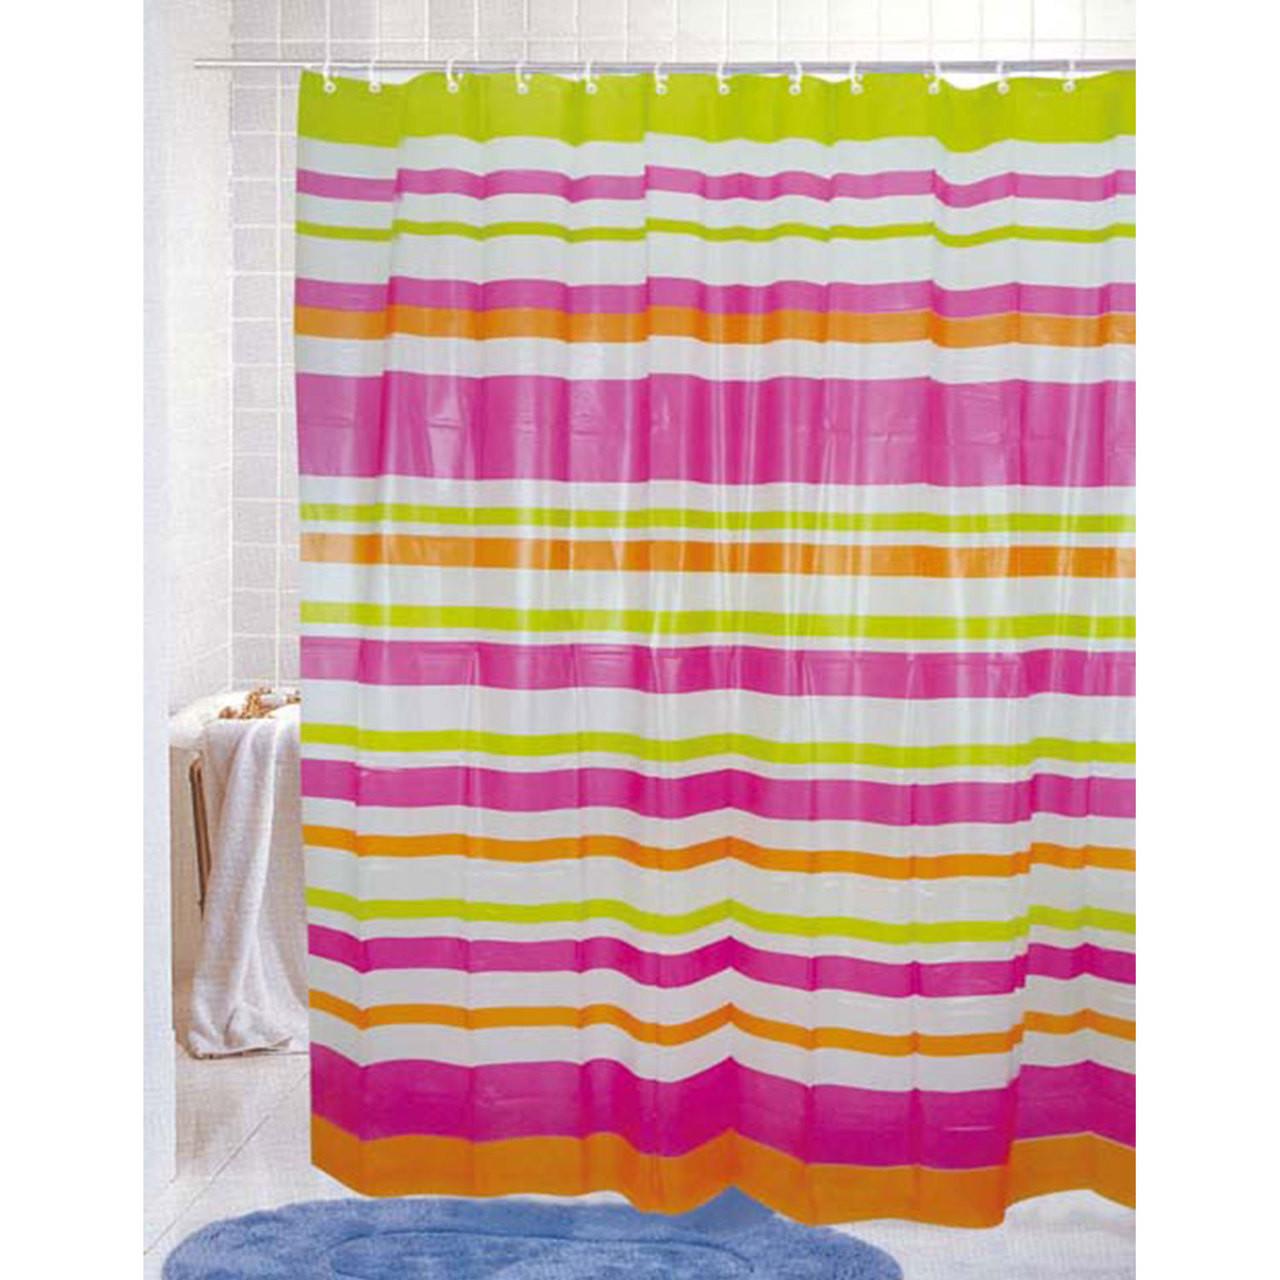 Pvc Free Peva Printed Shower Curtain Colorful Strata Stripes Print 70x72 Maggie